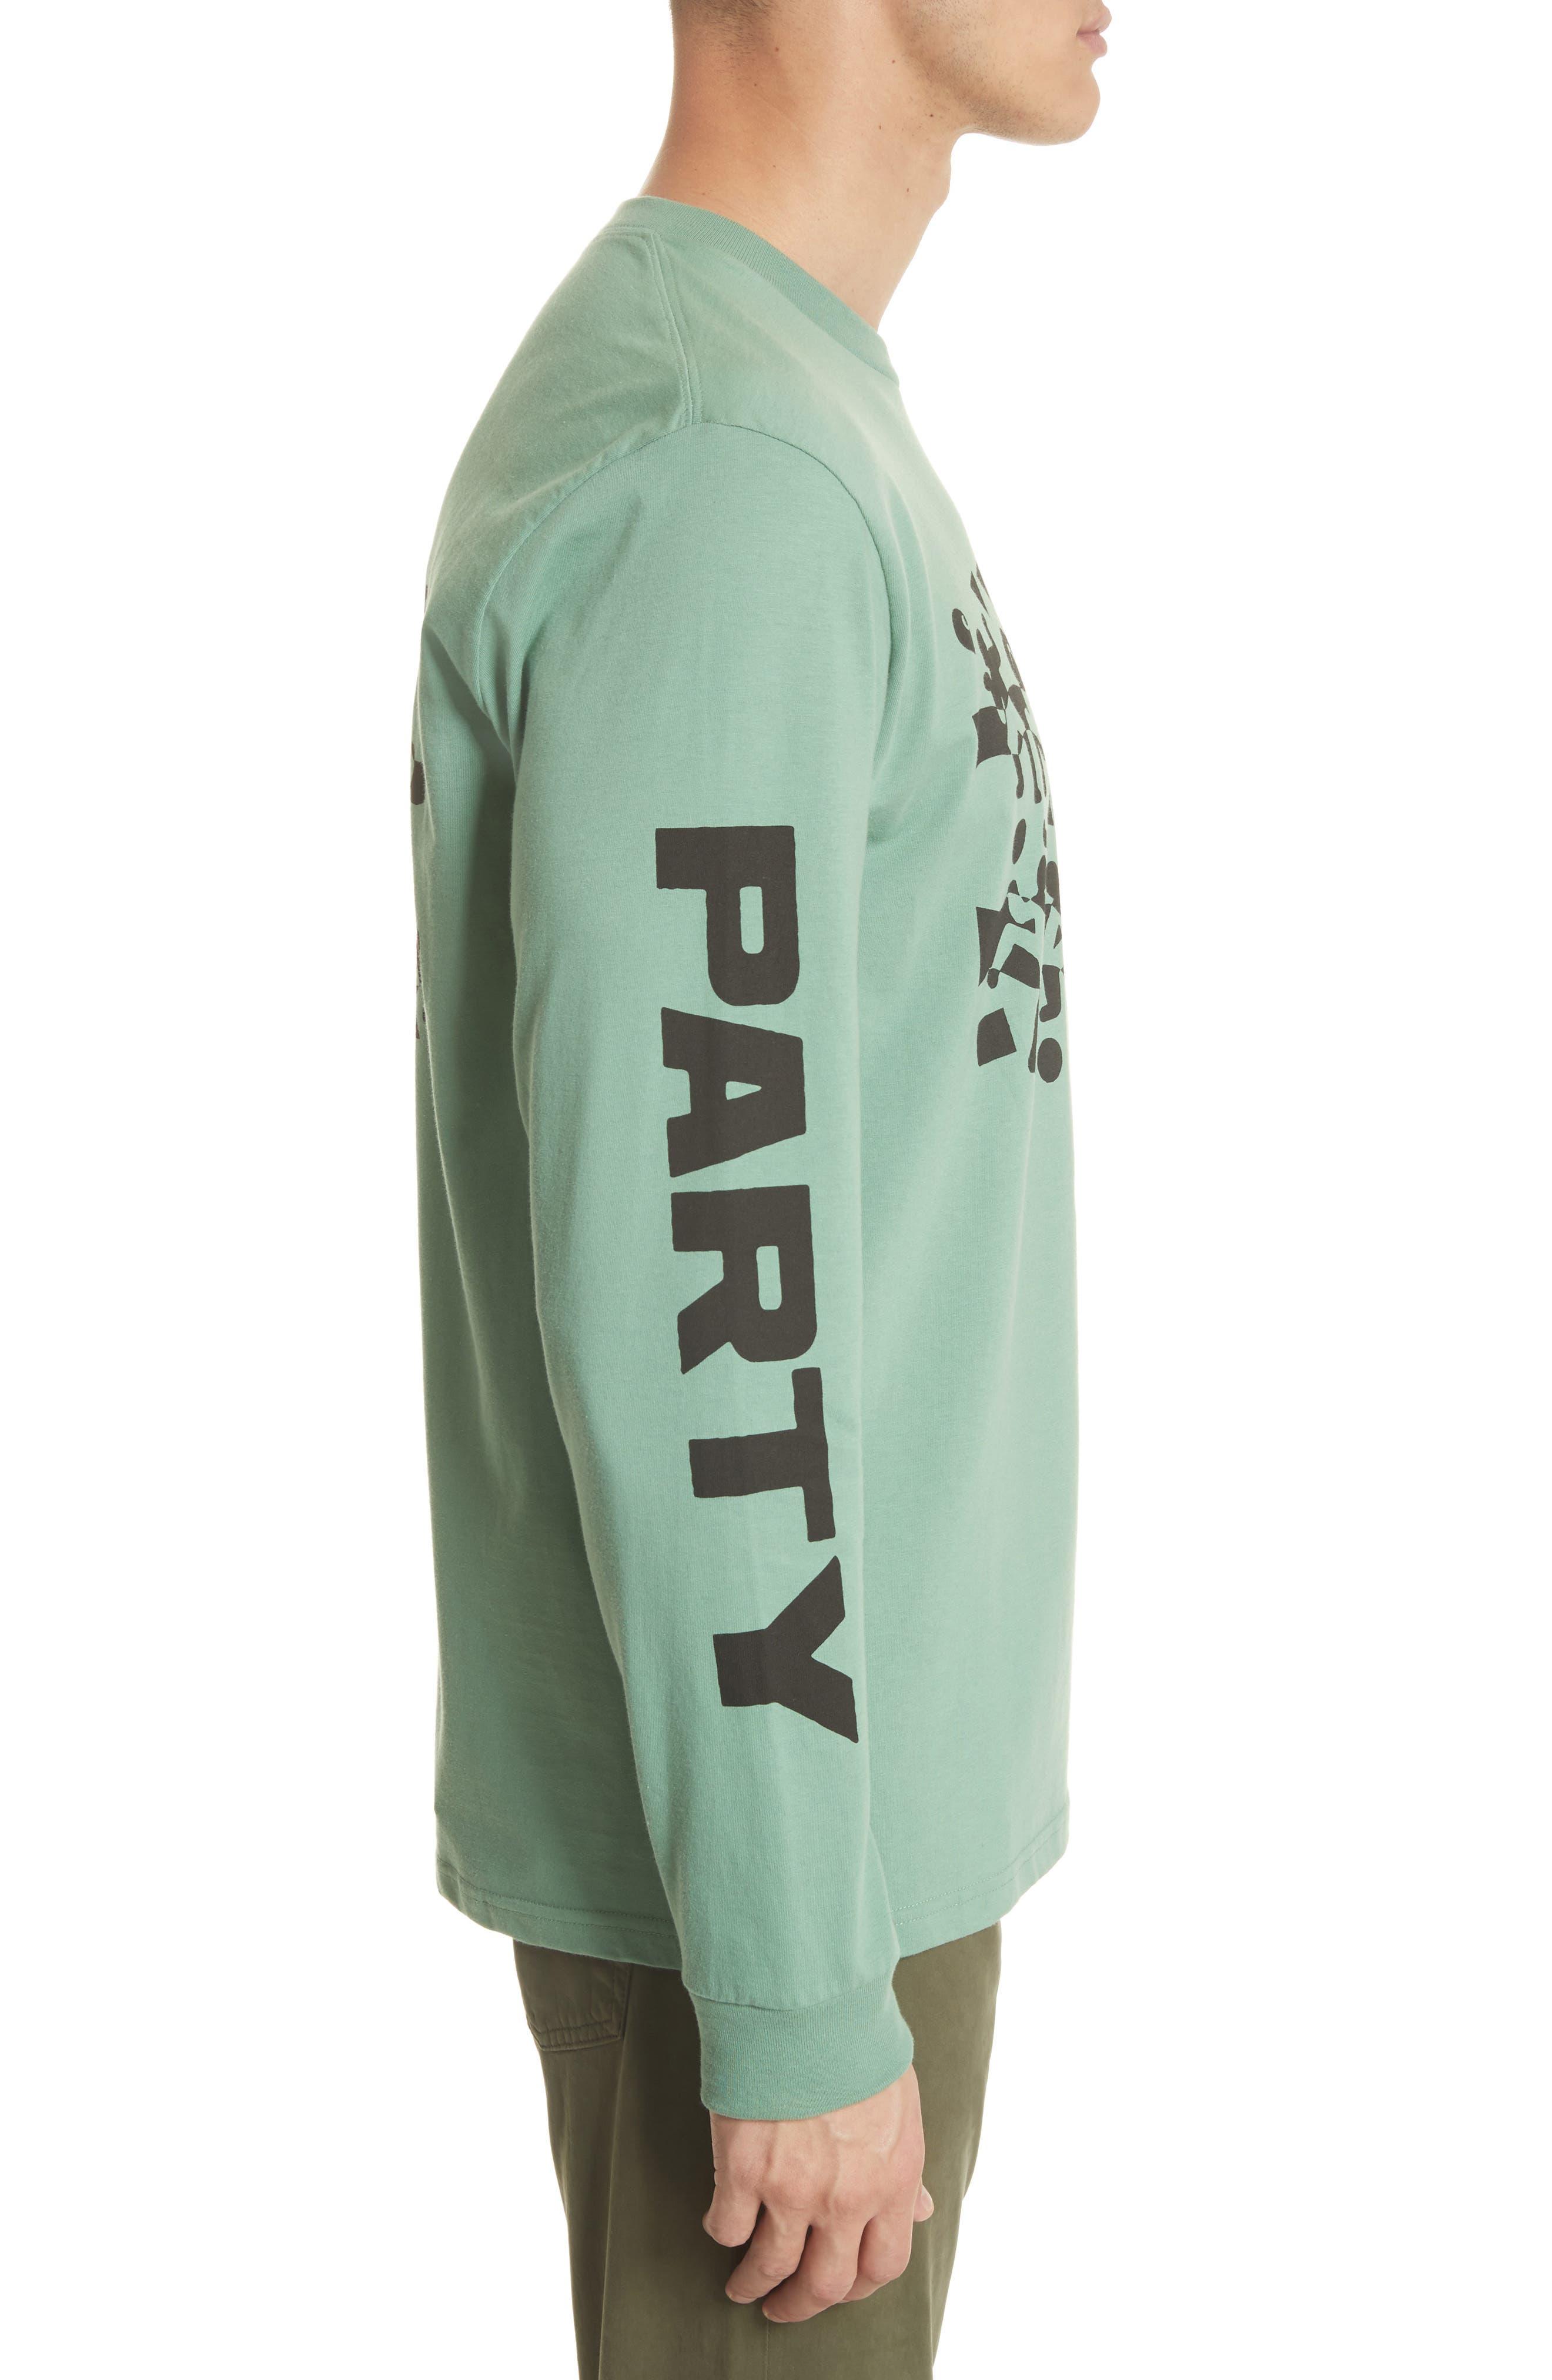 World Party T-Shirt,                             Alternate thumbnail 3, color,                             Catnip/Black